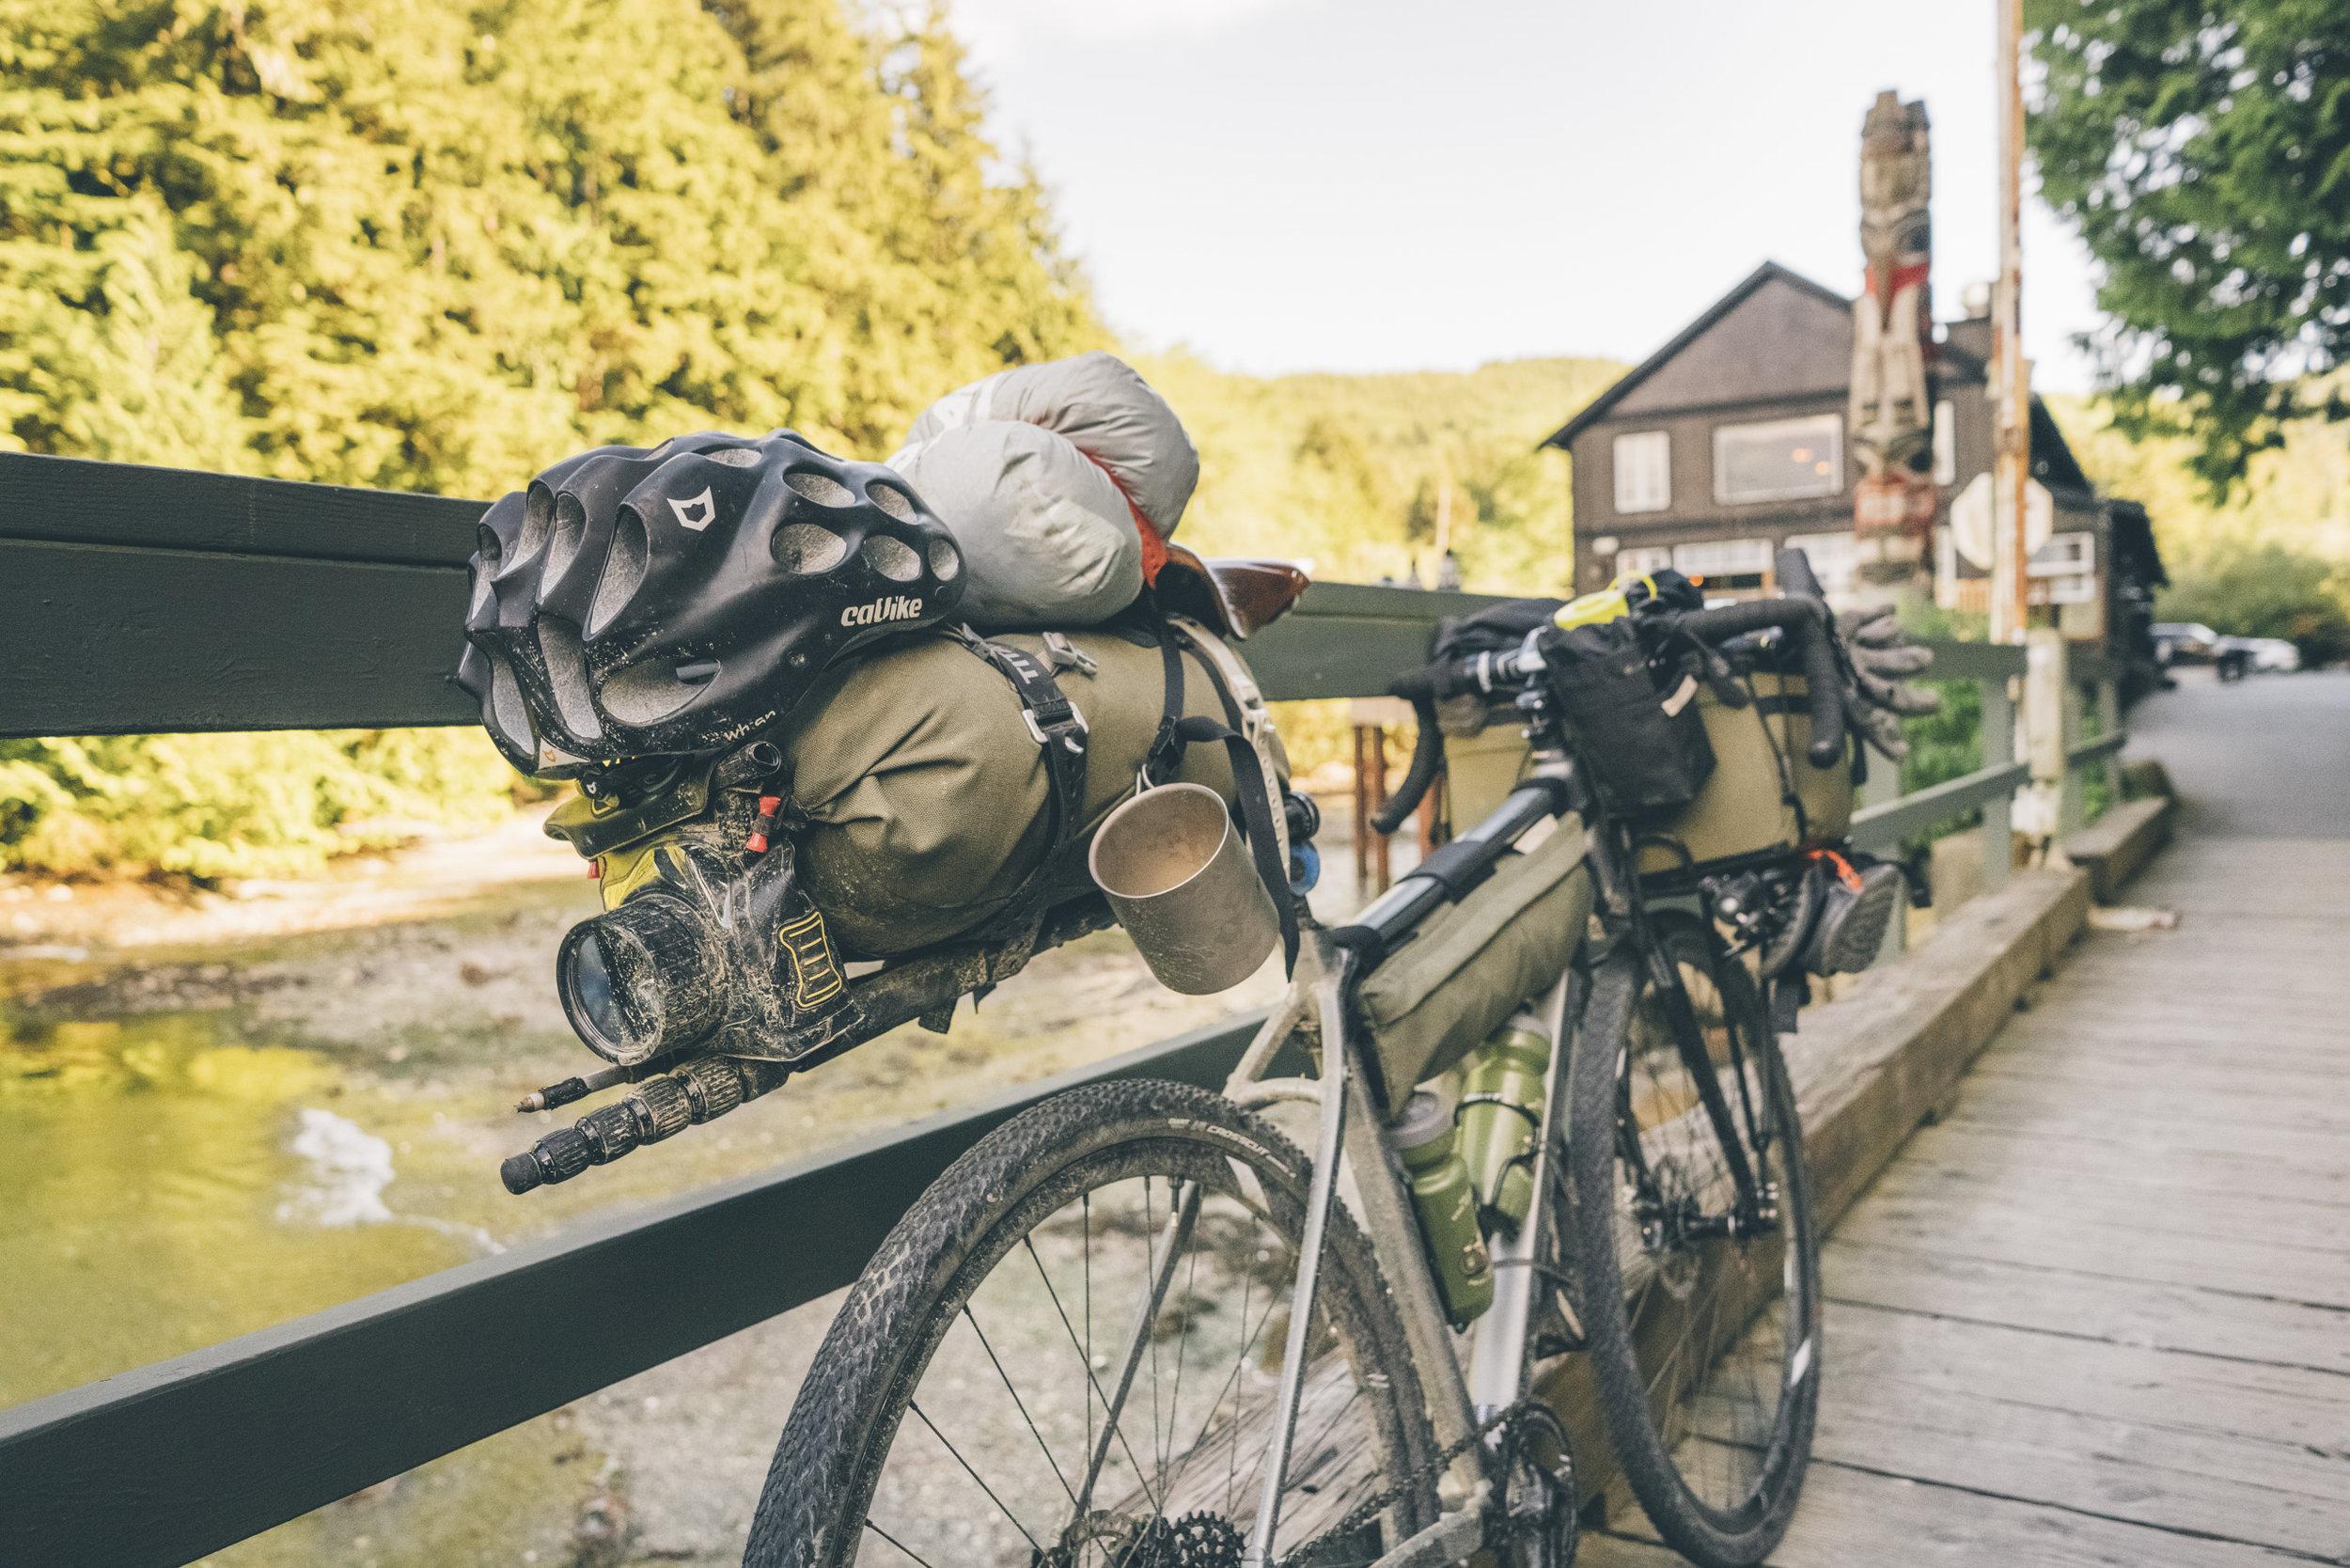 Bikepacking-VanIsland-JohnsonStudios-201806-126.jpg